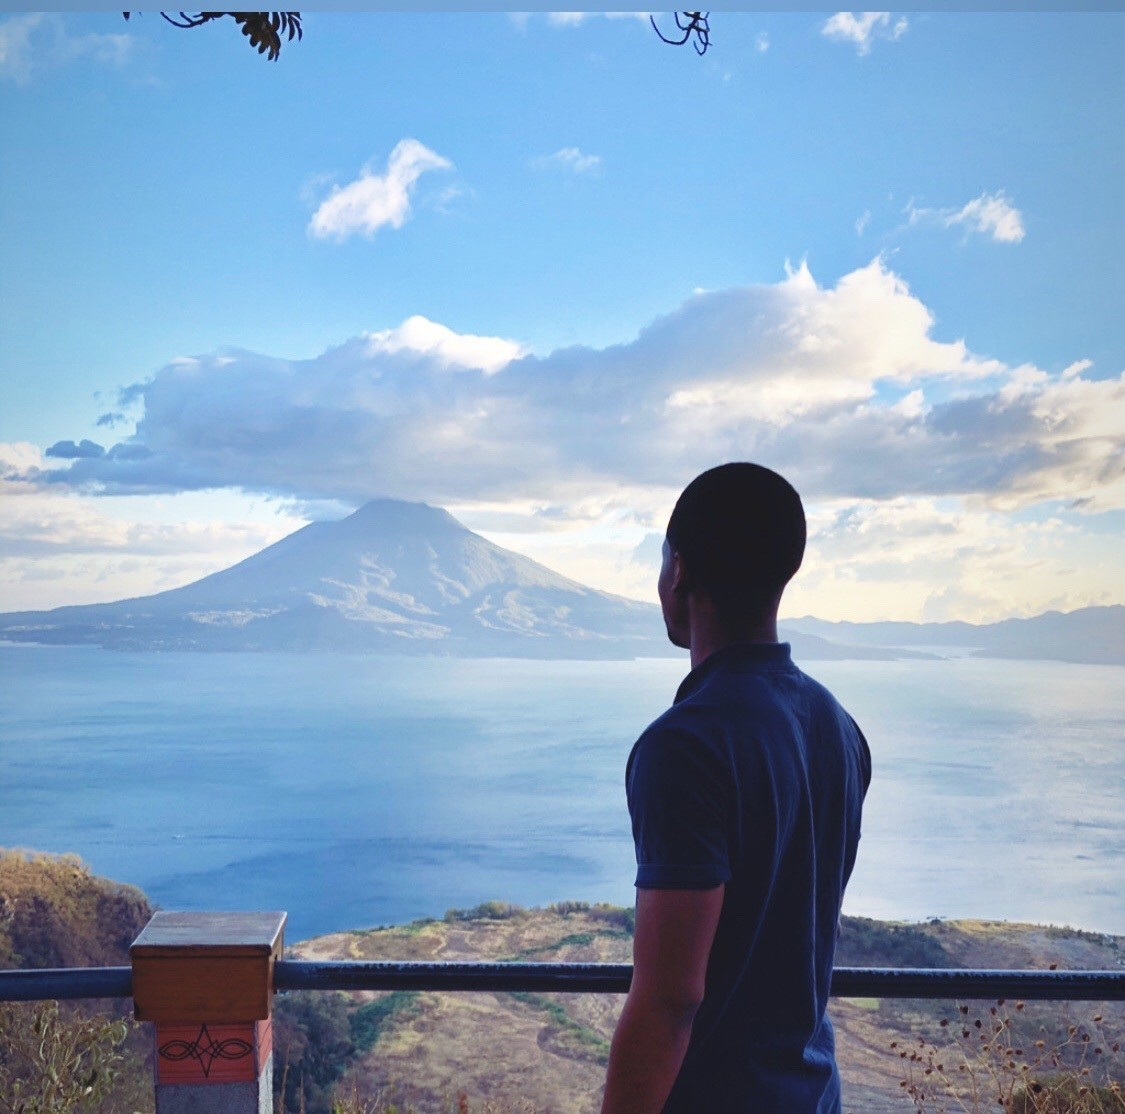 Overlooking Lake Atitlán